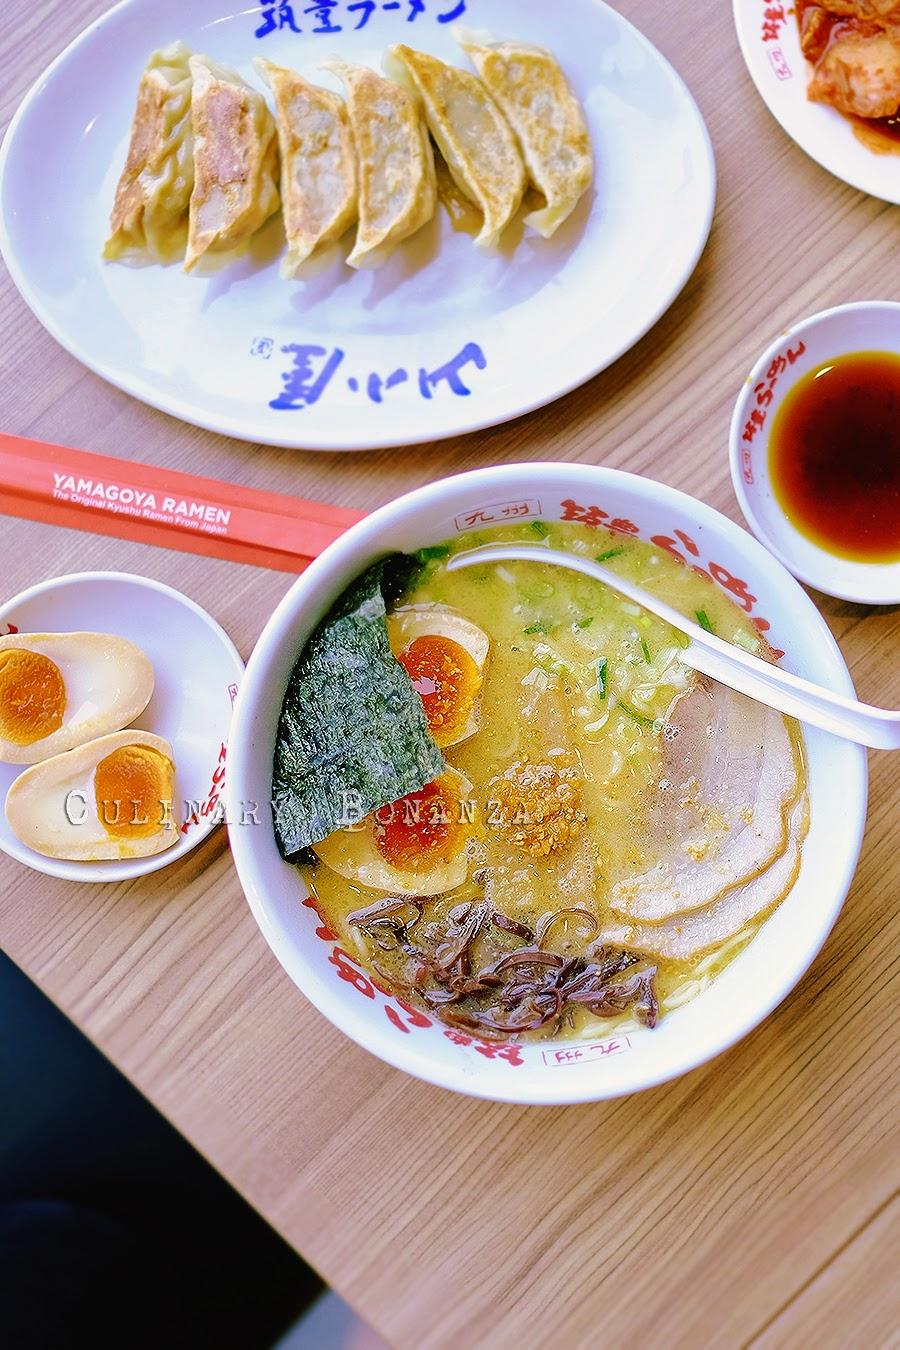 tonkotsu ramen, tamago and gyoza